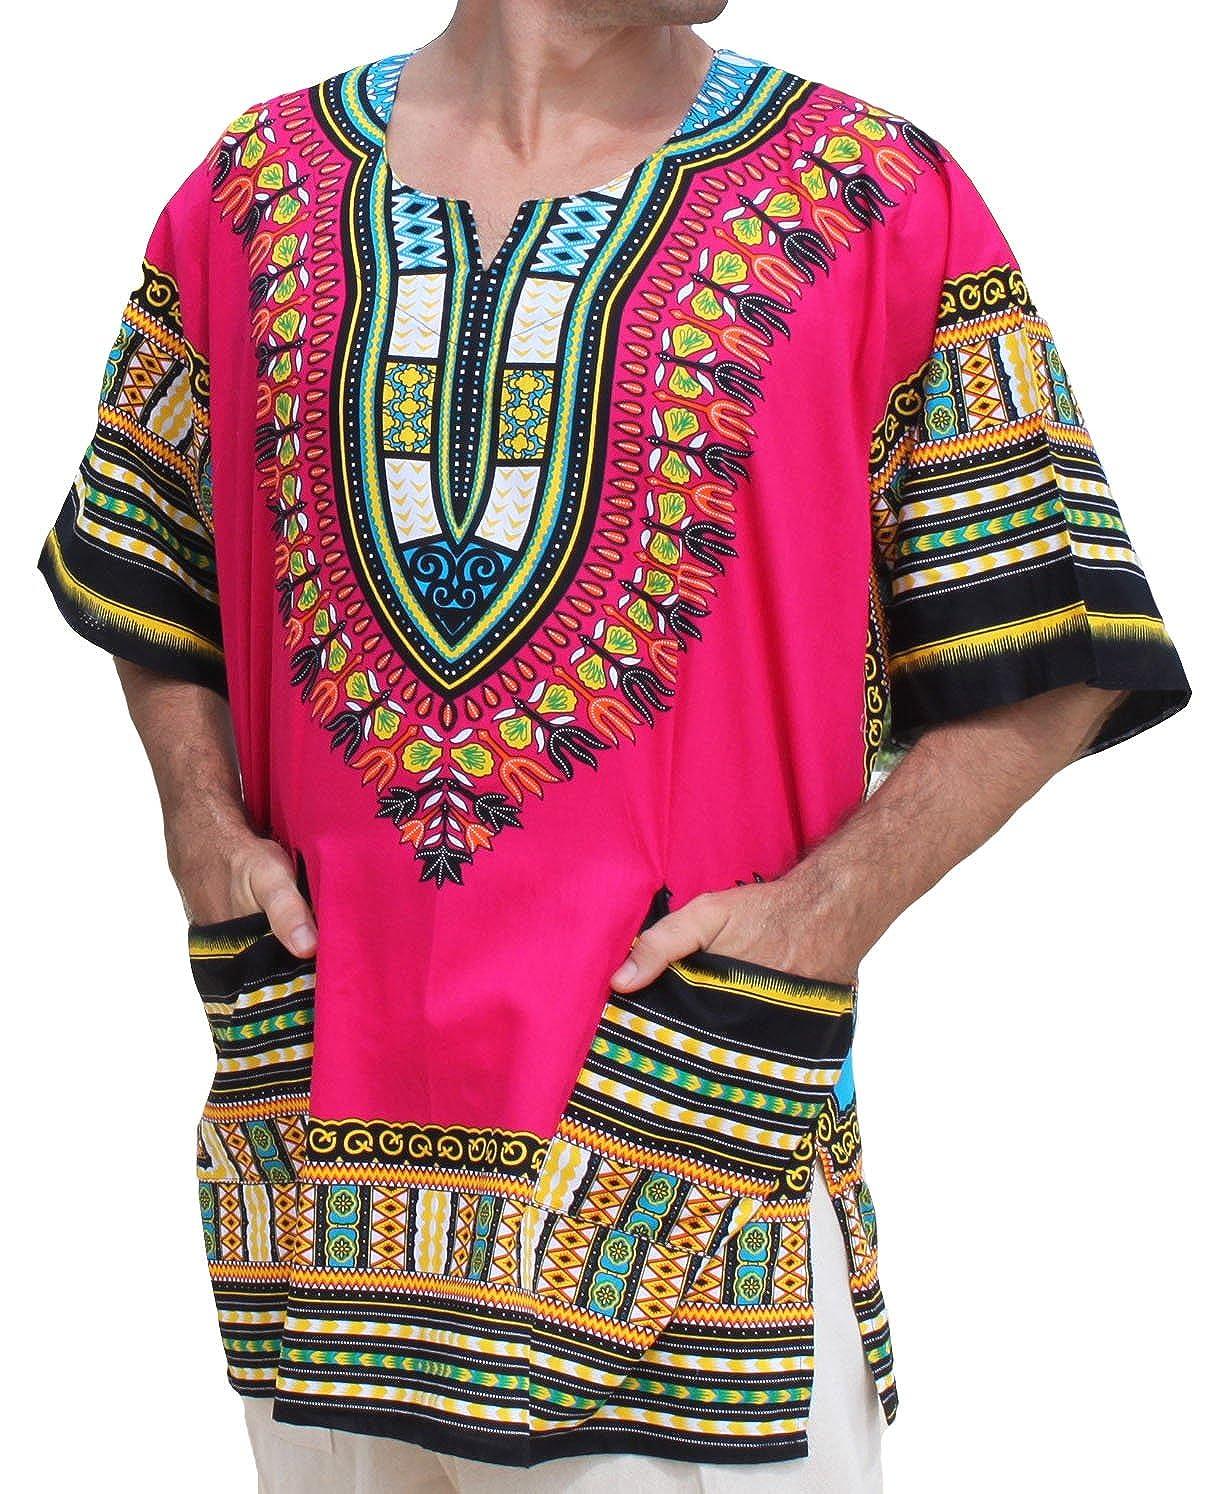 RaanPahMuang - Camiseta africana unisex de algodón, varios colores variant15060AMZ